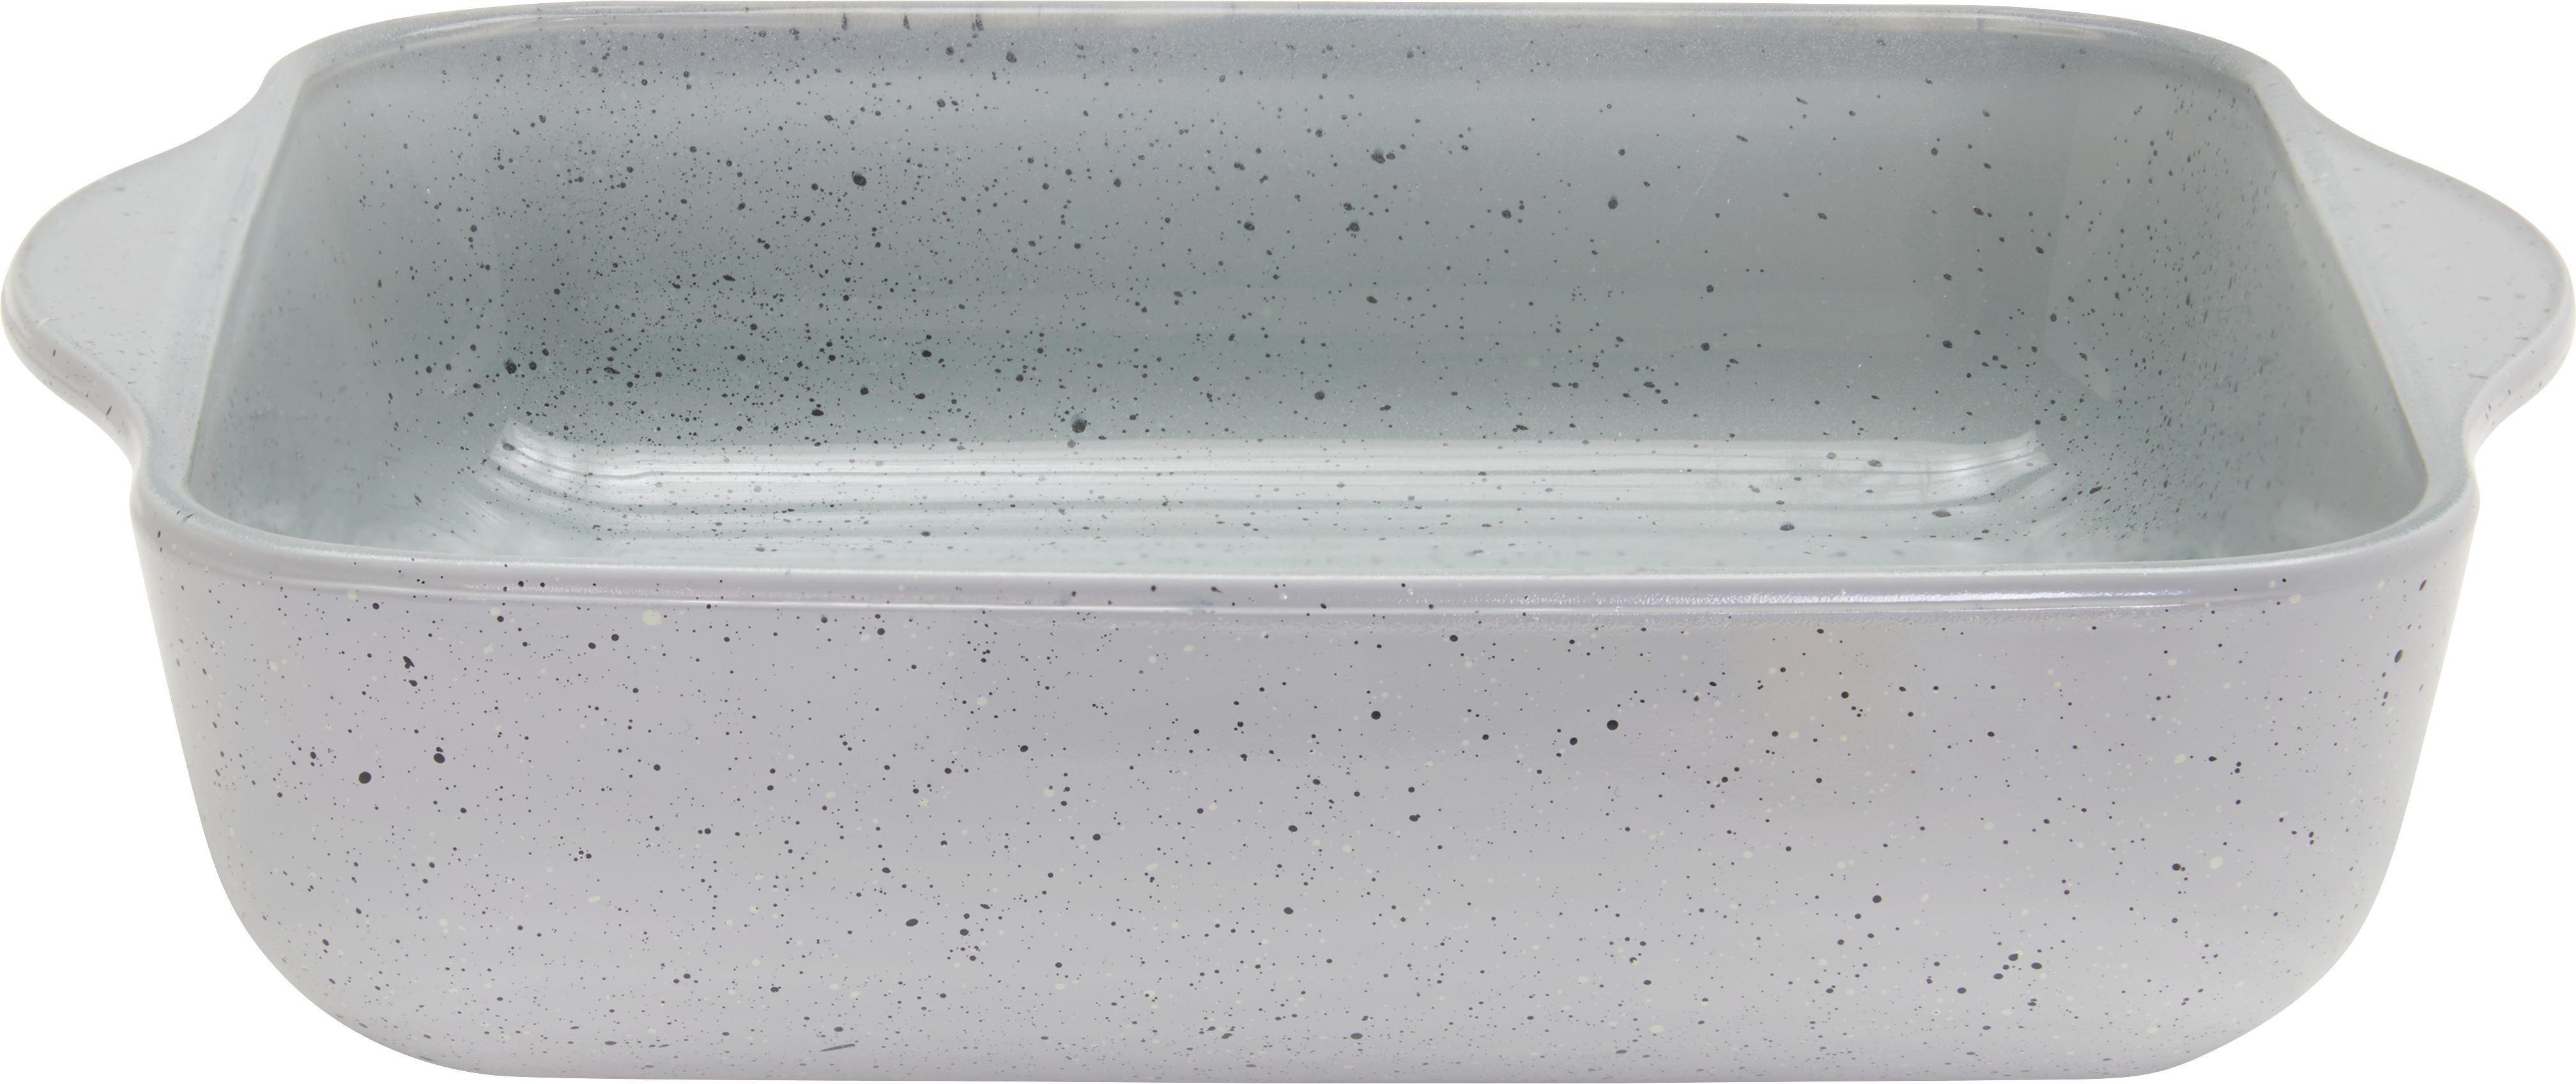 Auflaufform Sharon in Grau - Grau, Glas (25,6/18,4/5cm) - MÖMAX modern living